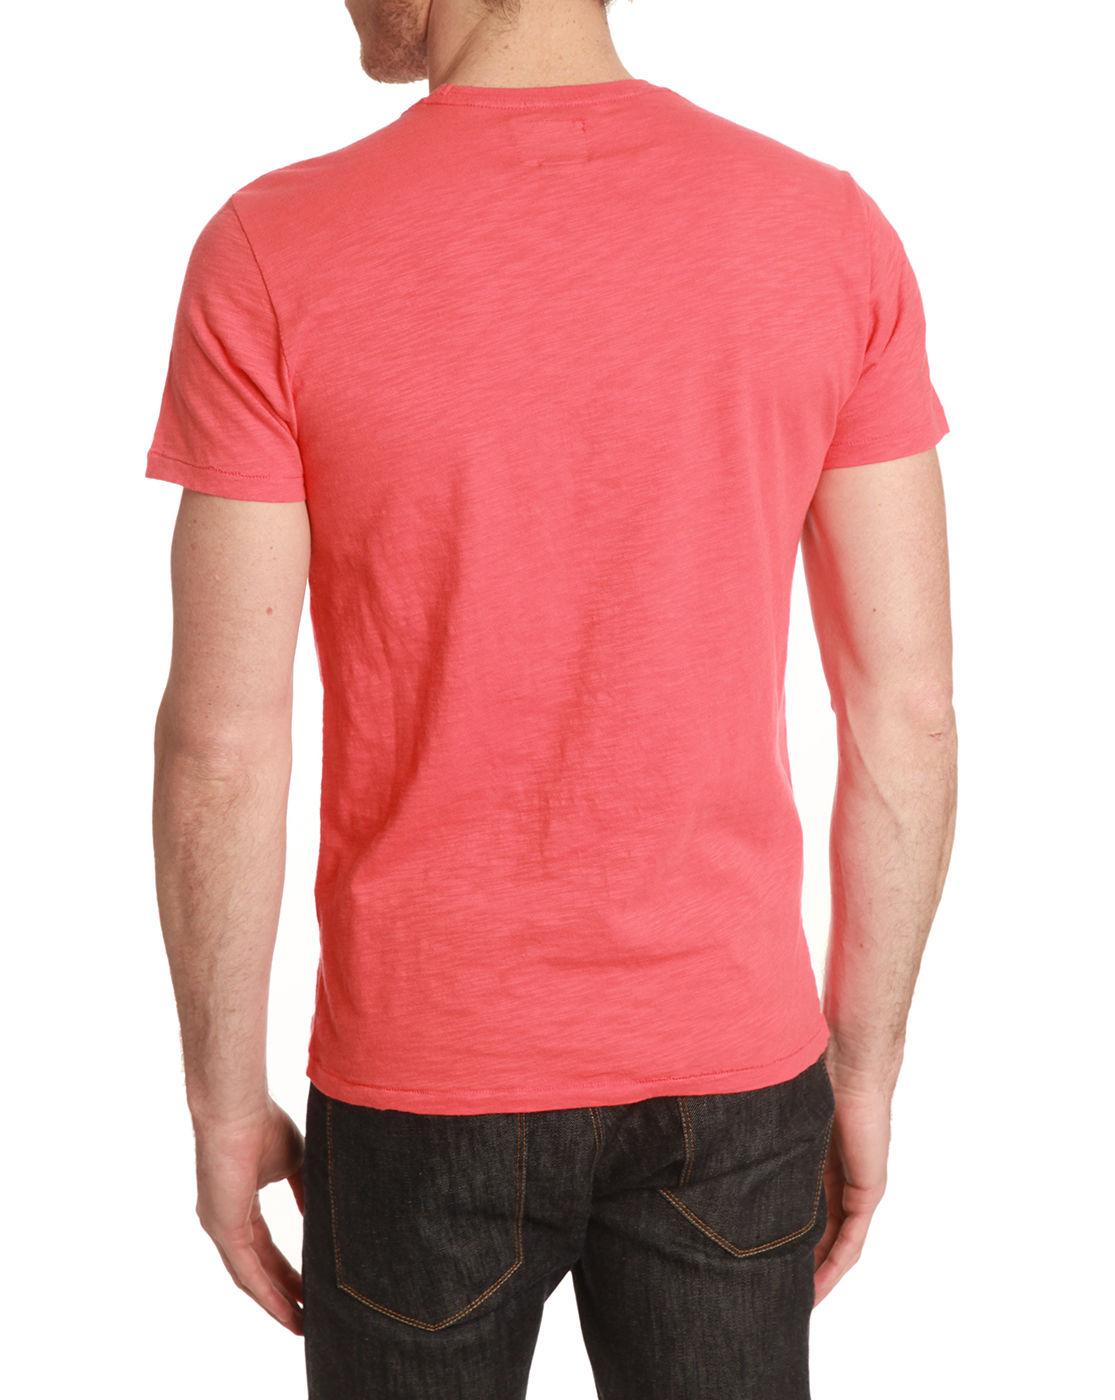 Woolrich Kauai Coral T Shirt In Orange For Men Coral Lyst